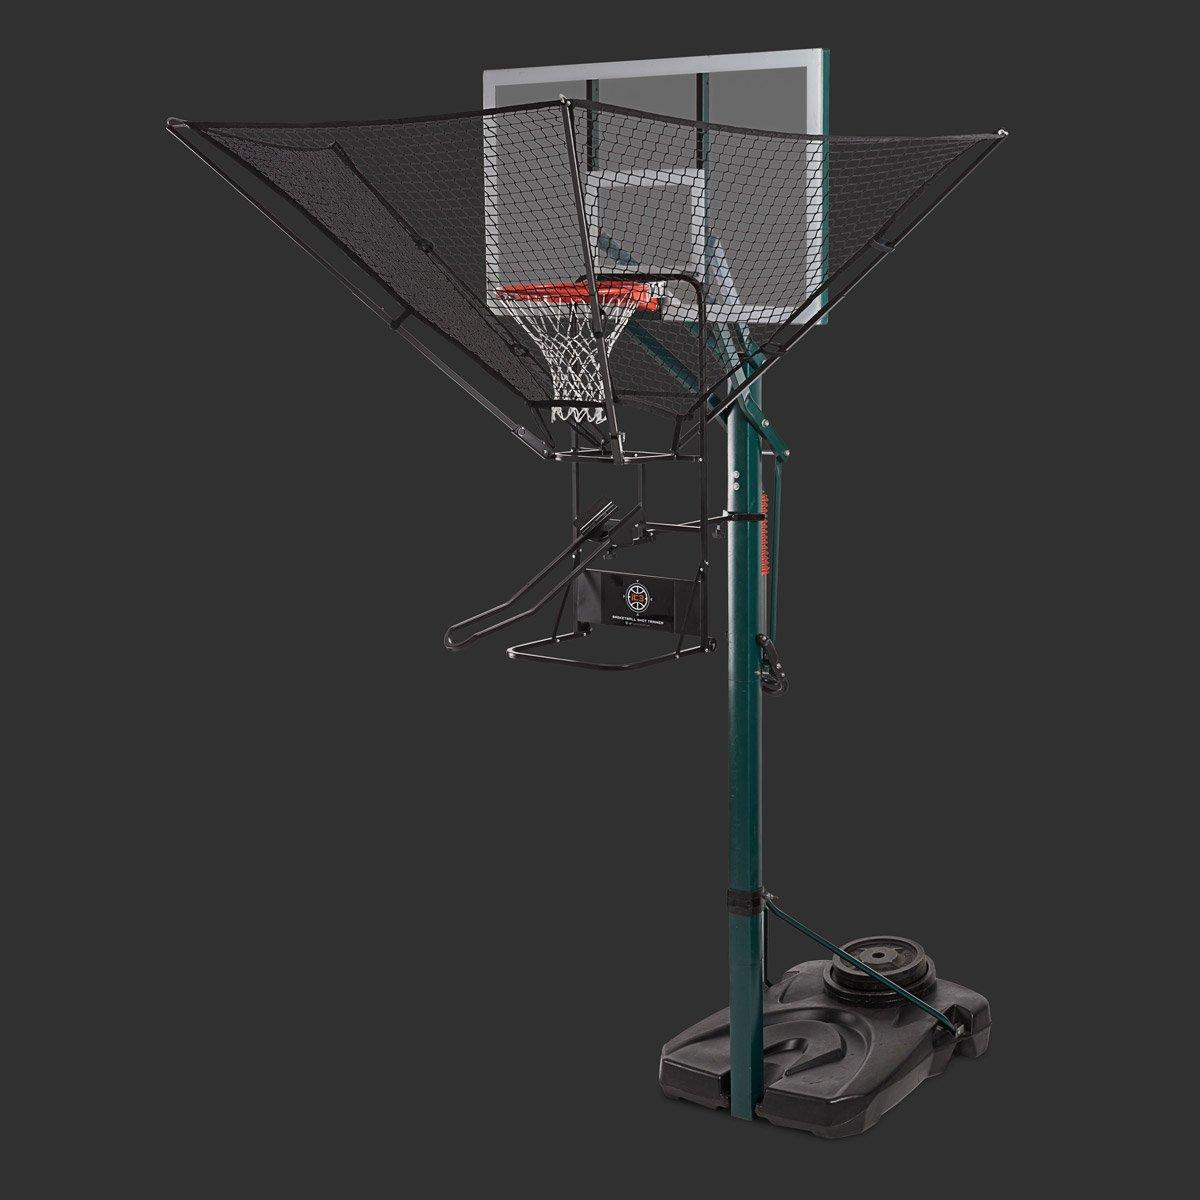 ic3 Basketball Trainer on Portable Basketball Hoop